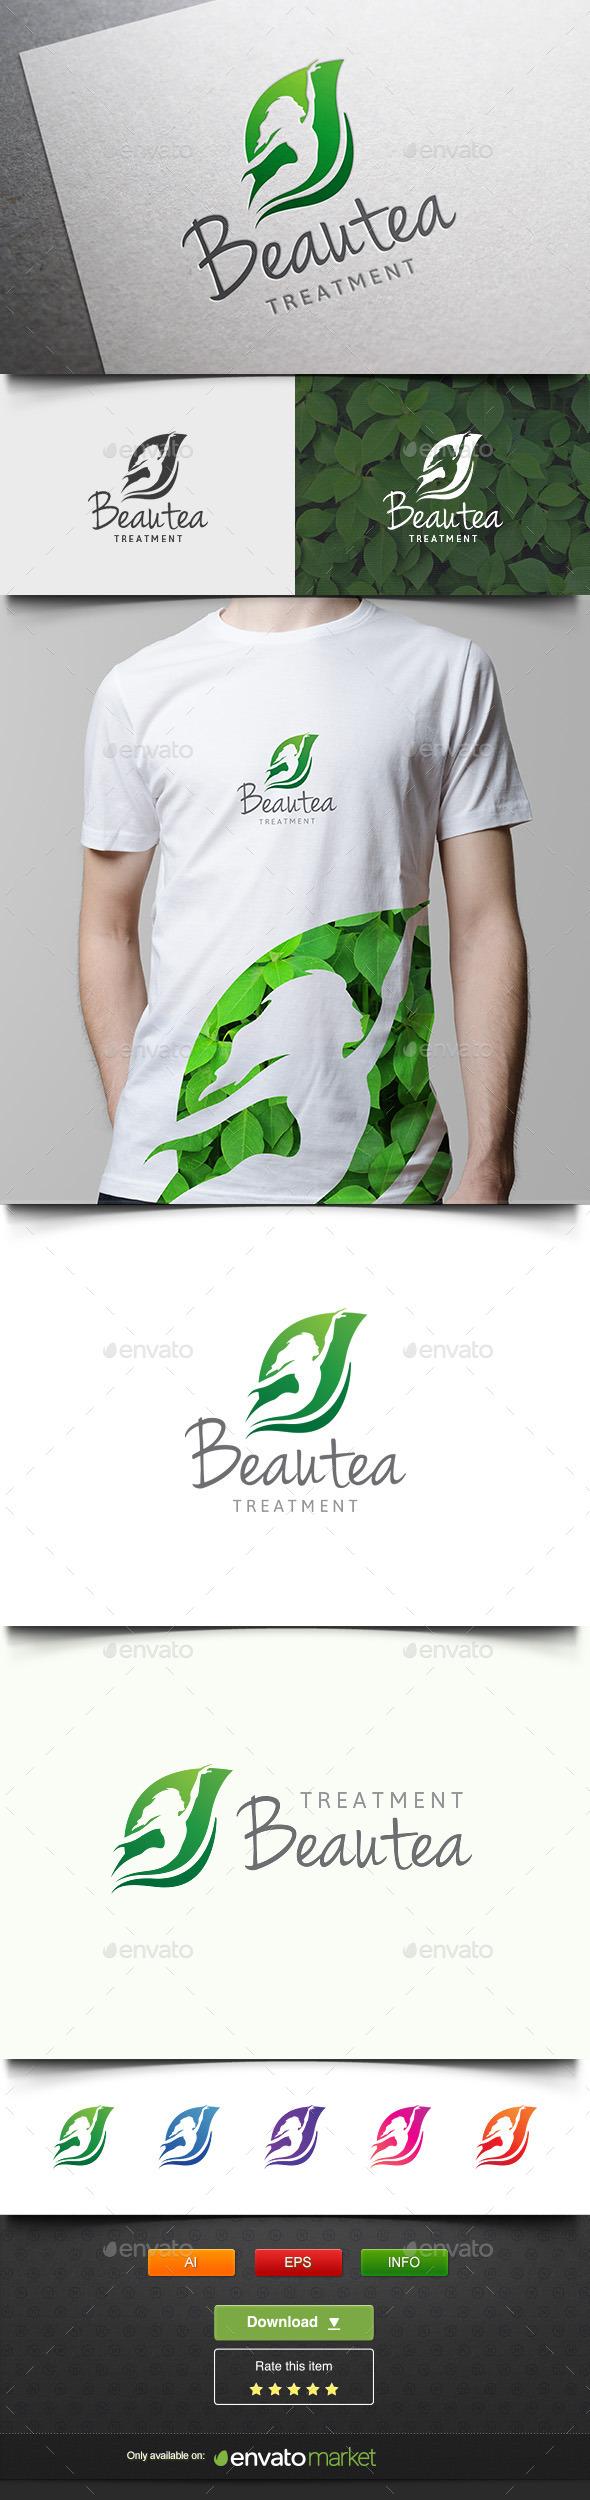 Beauty Treatment - Nature Logo Templates